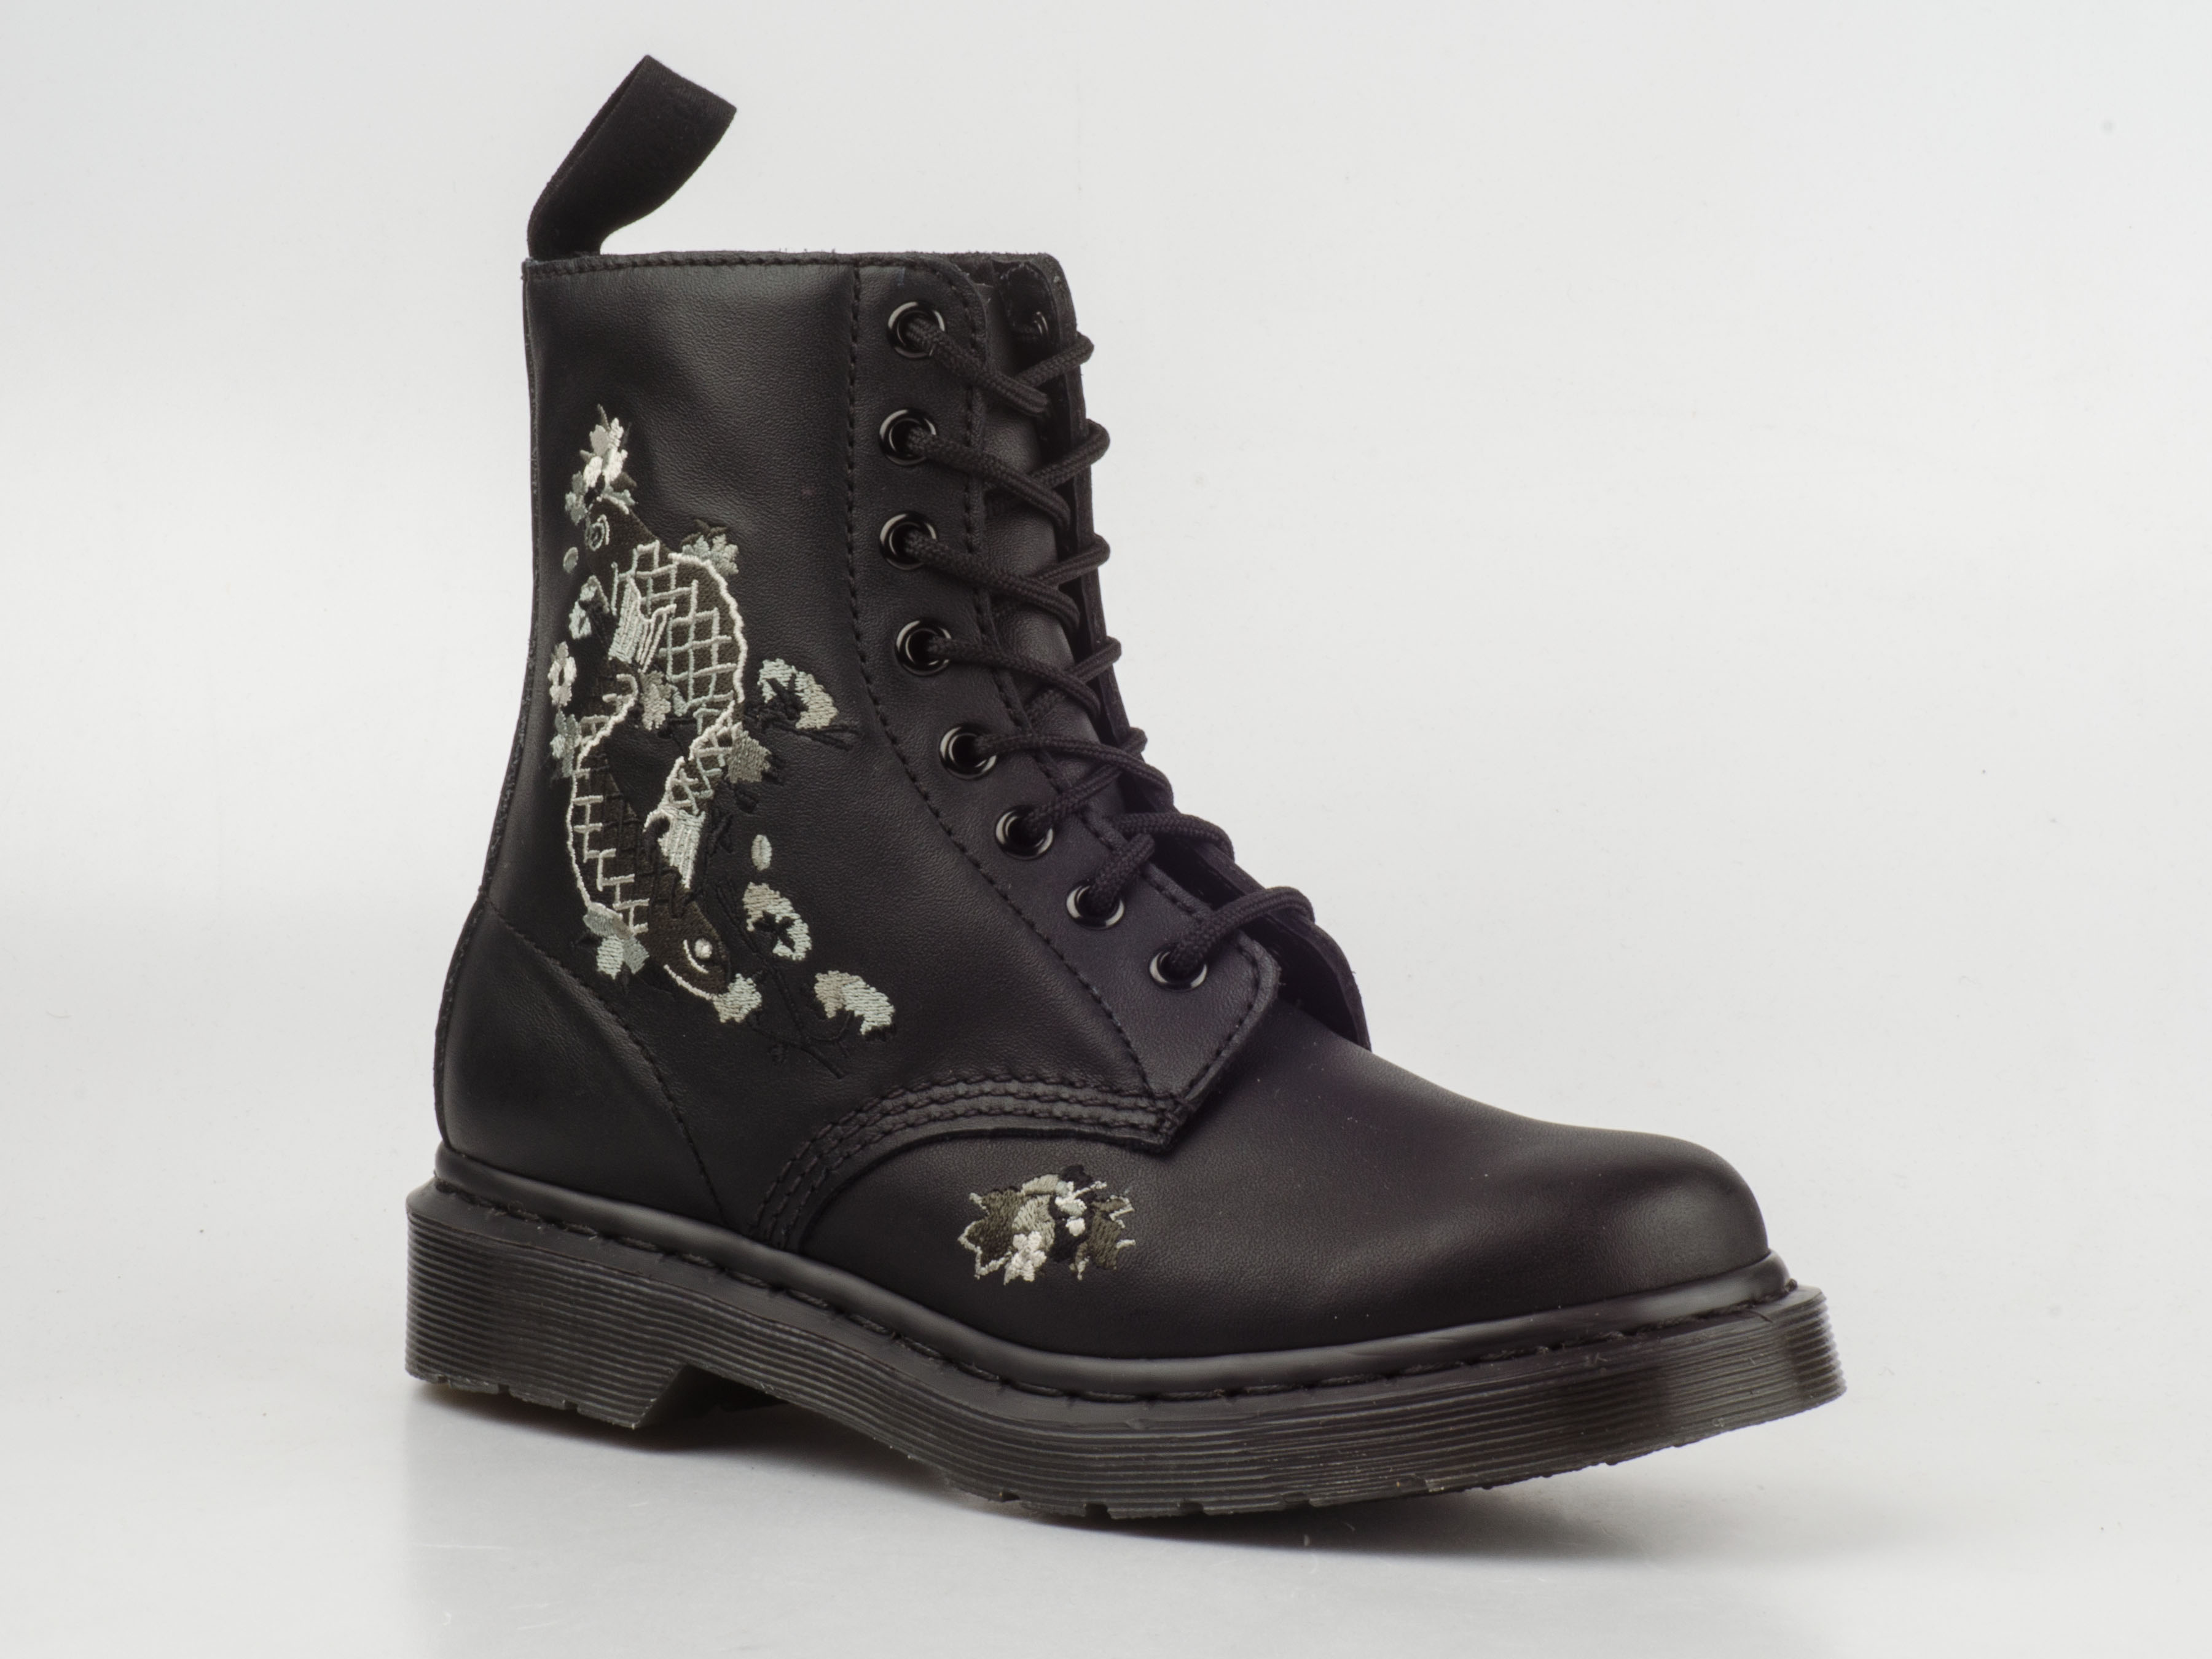 dr doc martens 16716001 amylee 8 loch stiefel 8eye boots. Black Bedroom Furniture Sets. Home Design Ideas